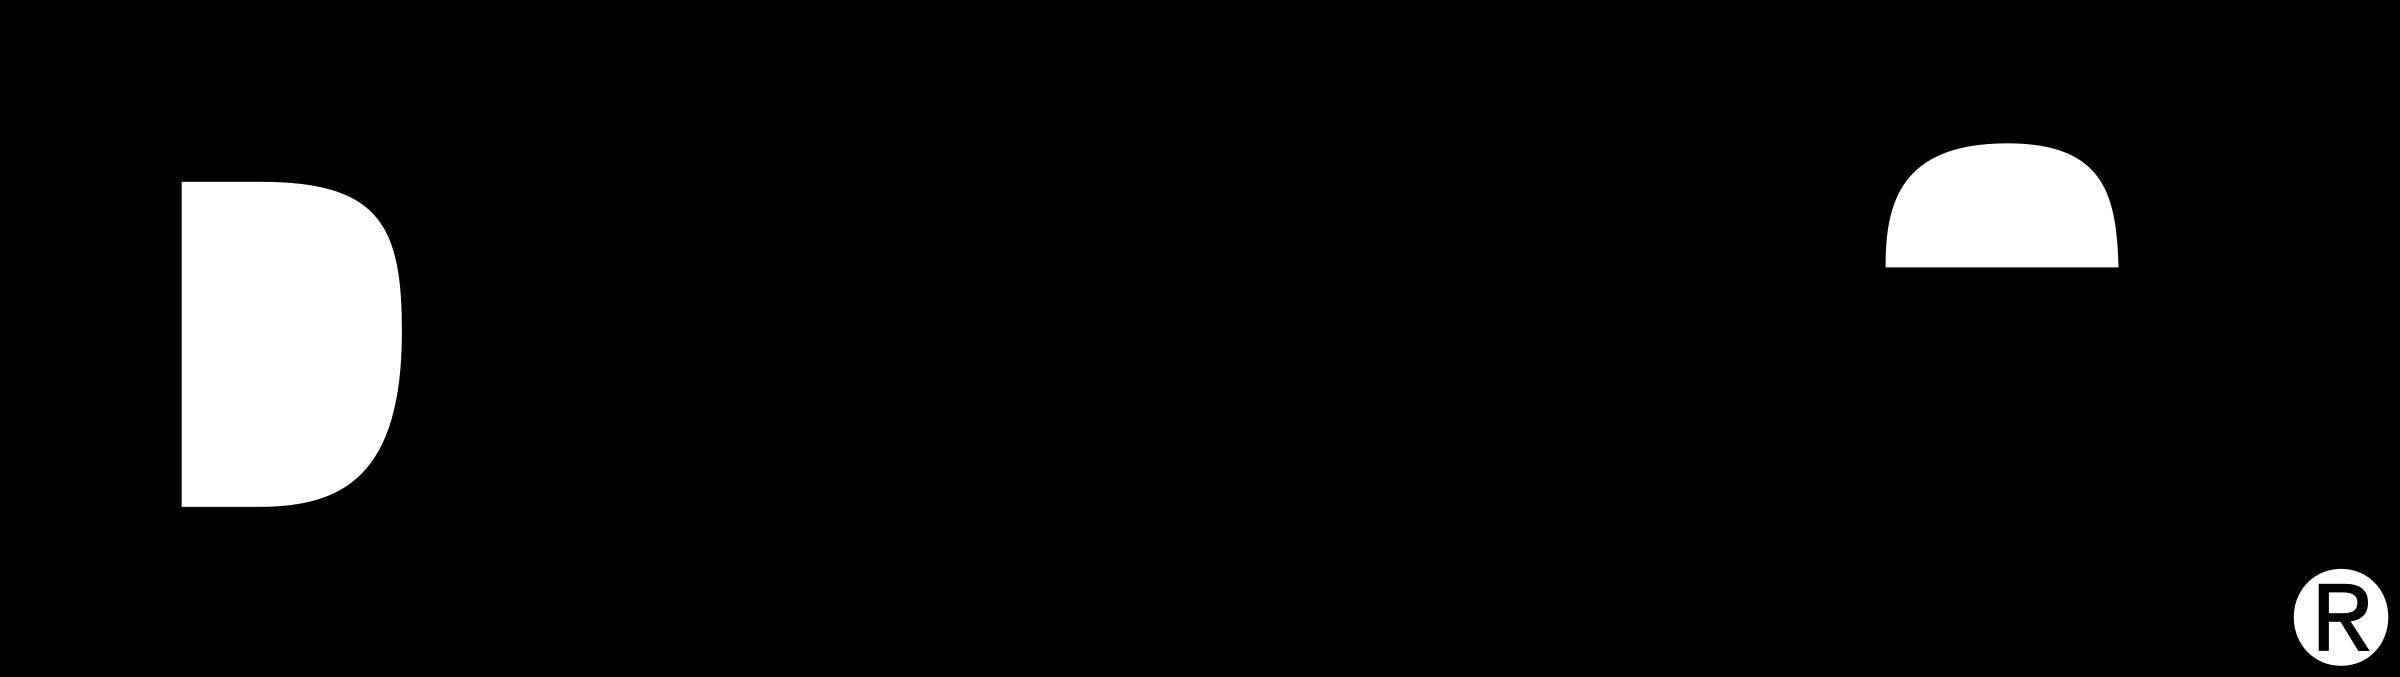 DIXIE 2 Logo PNG Transparent & SVG Vector.